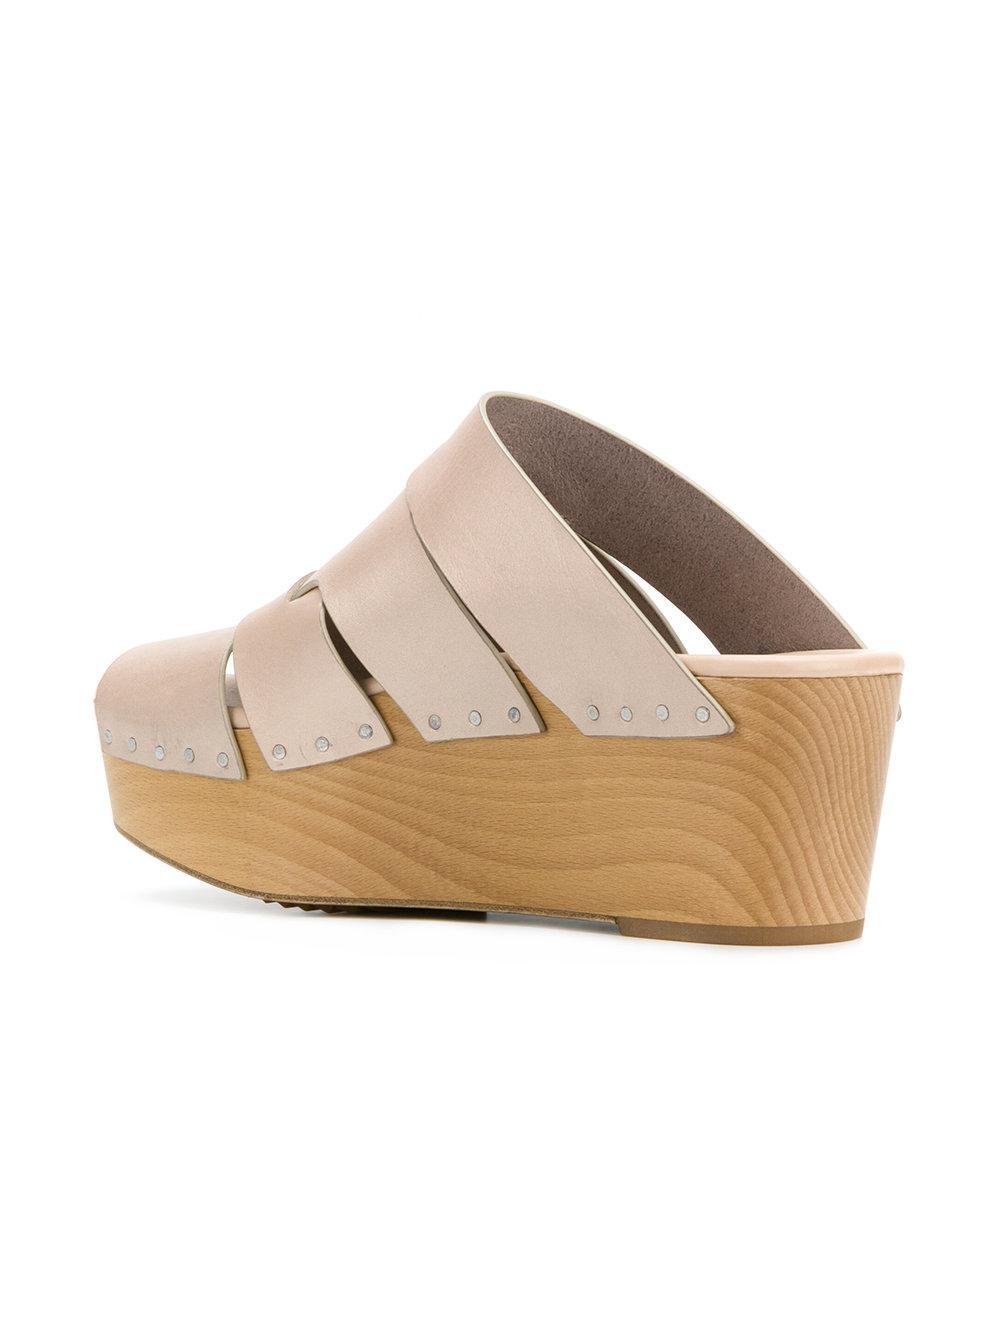 platform sandals - Nude & Neutrals Rick Owens T1Iztt